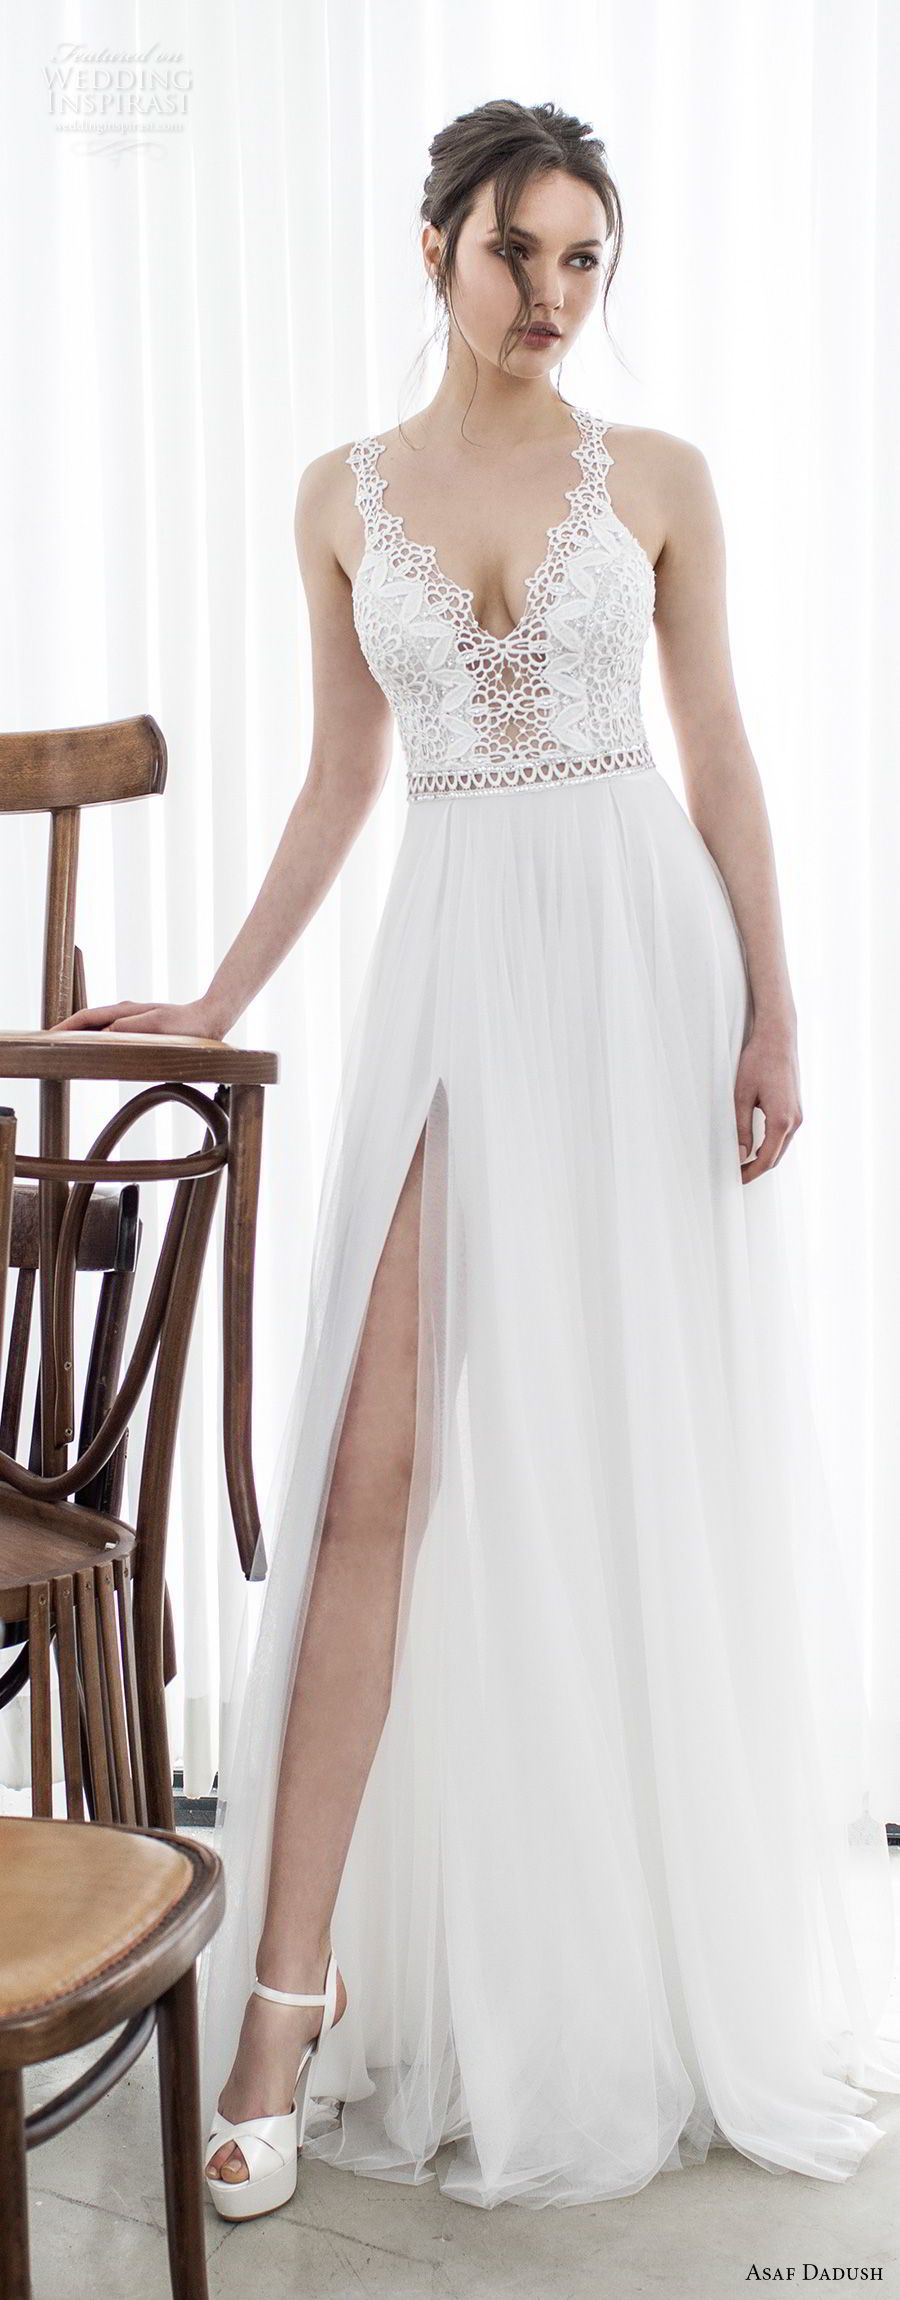 Asaf dadush wedding dresses bodice romantic and wedding dress